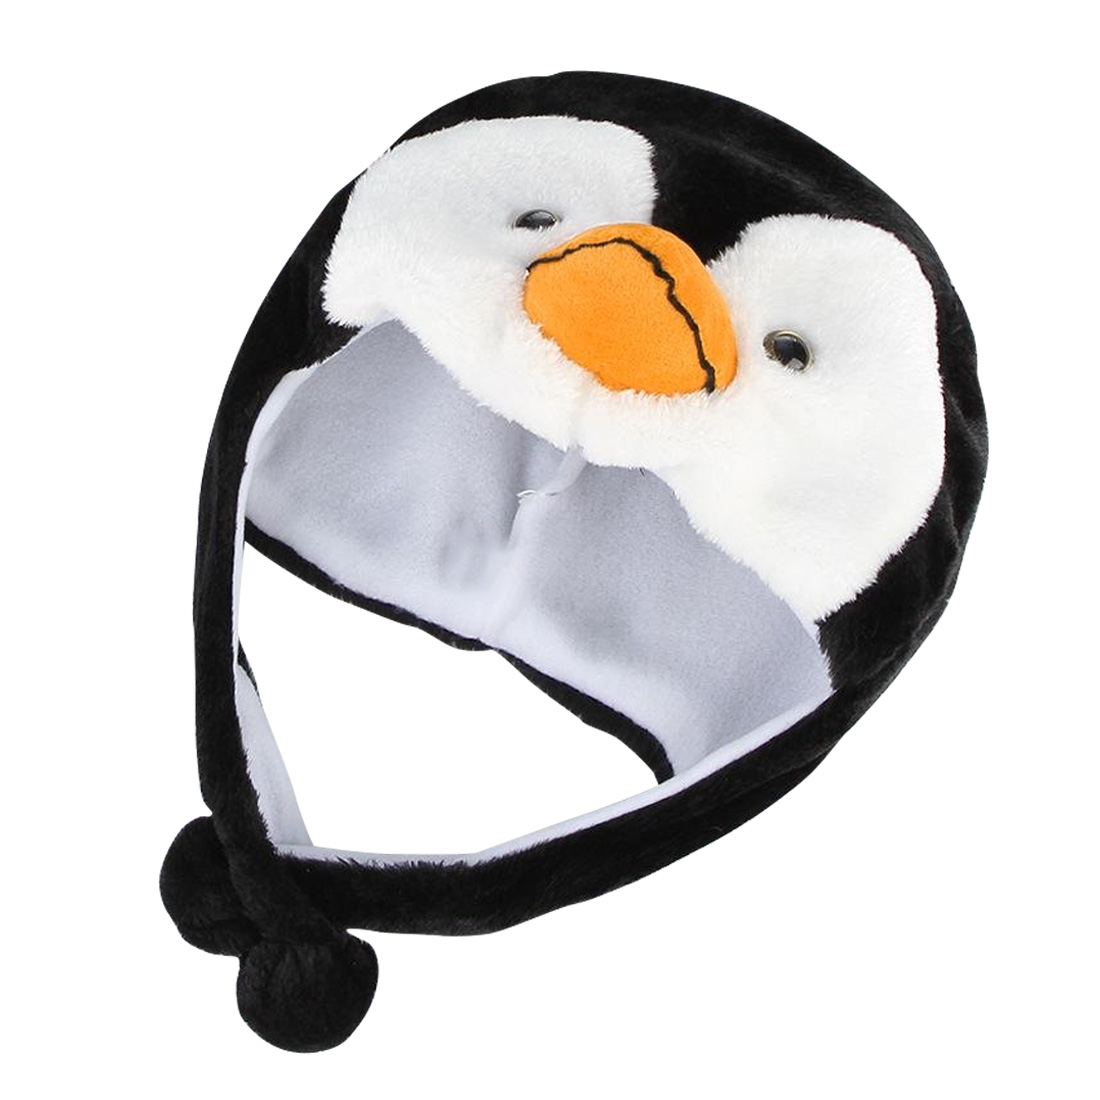 russia Penguin earmuffs 1PCS Cartoon Animal Mascot Plush Warm Cap Hat Warmer New